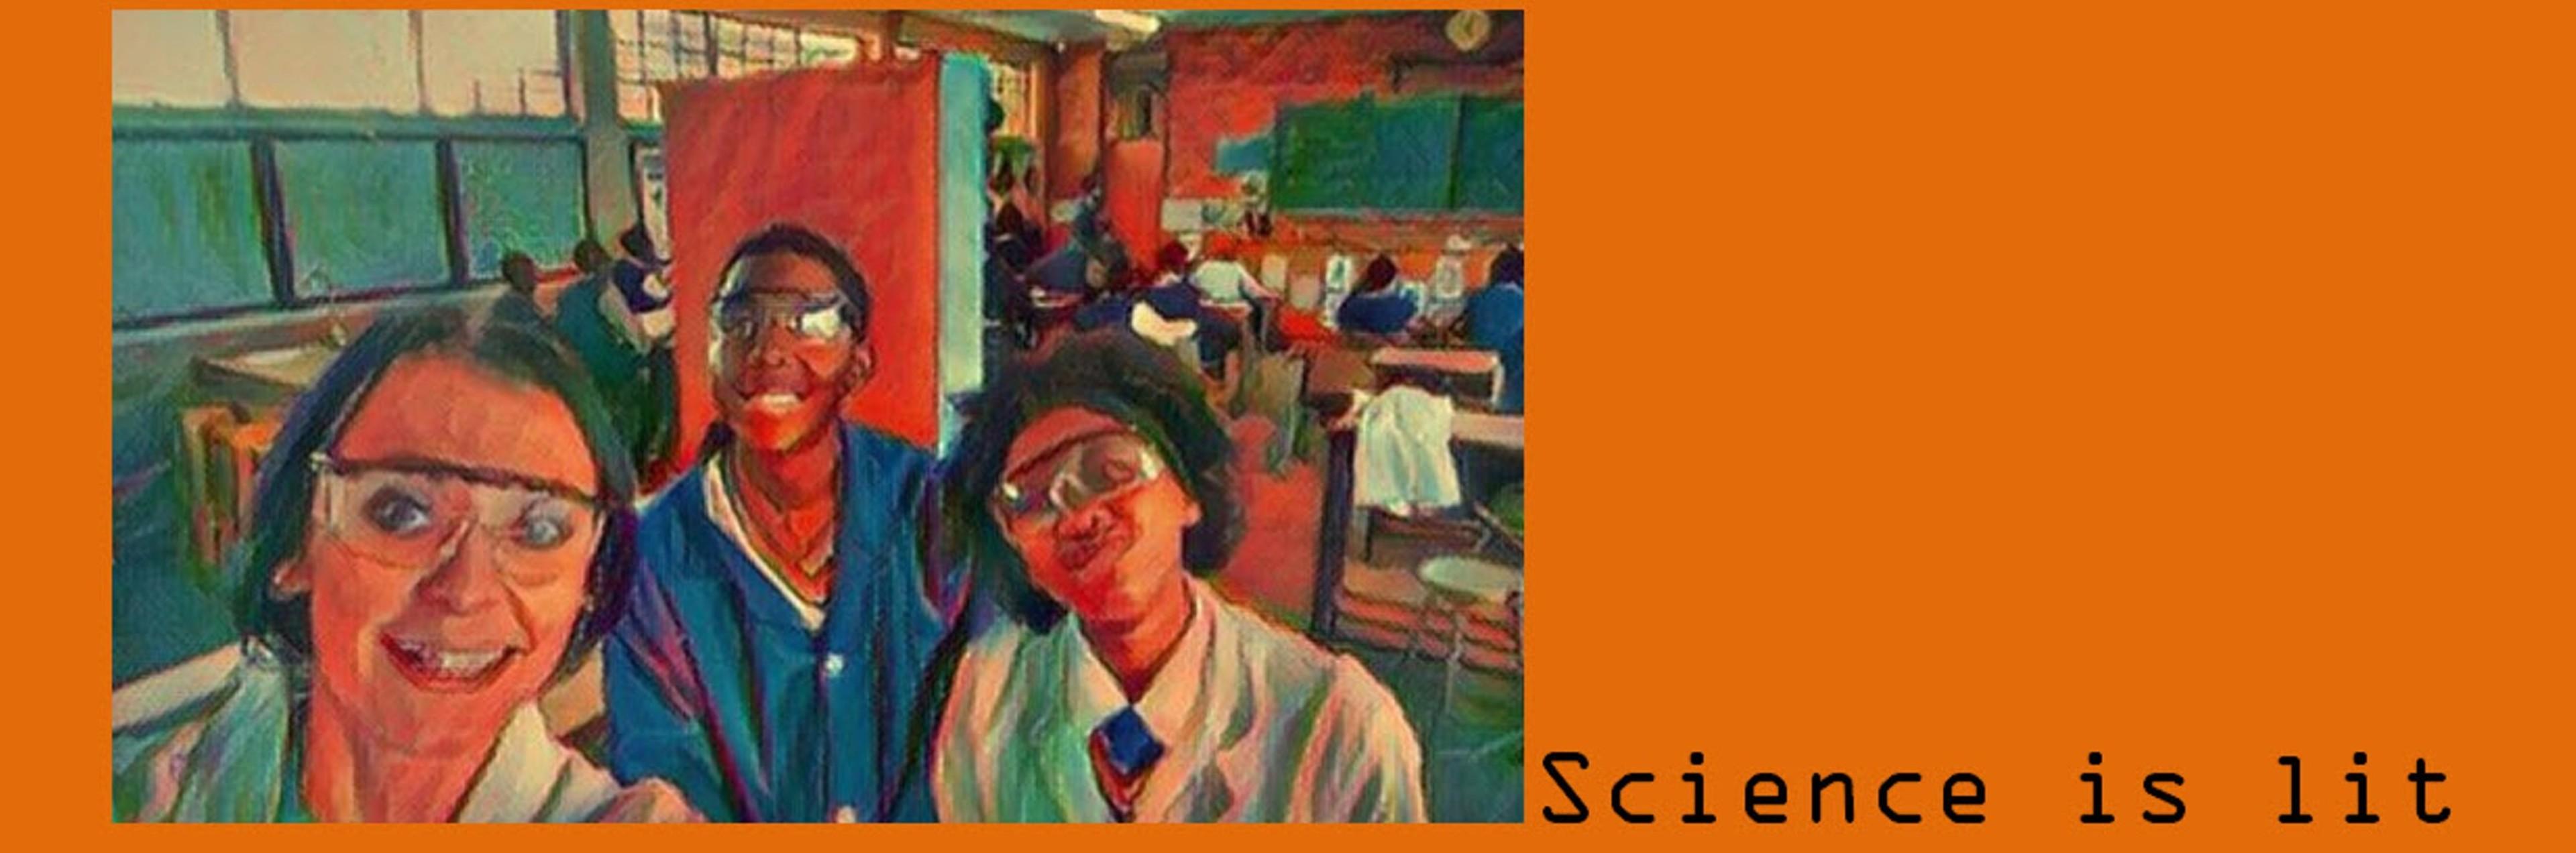 science_is_lit